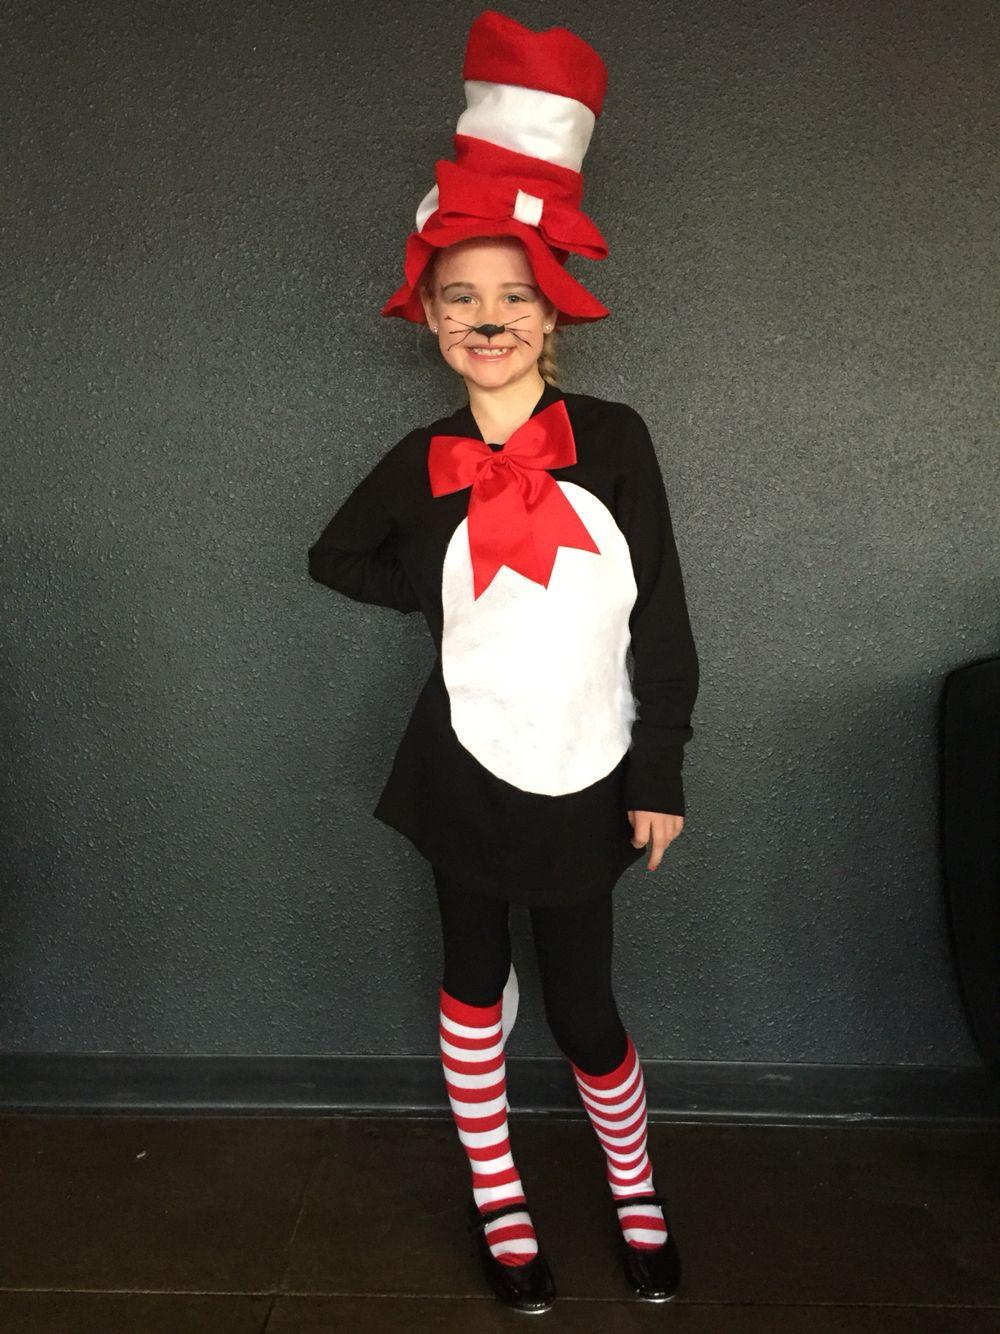 Cat in the Hat Socks Dr Seuss Fancy Dress Halloween Adult Costume Accessory